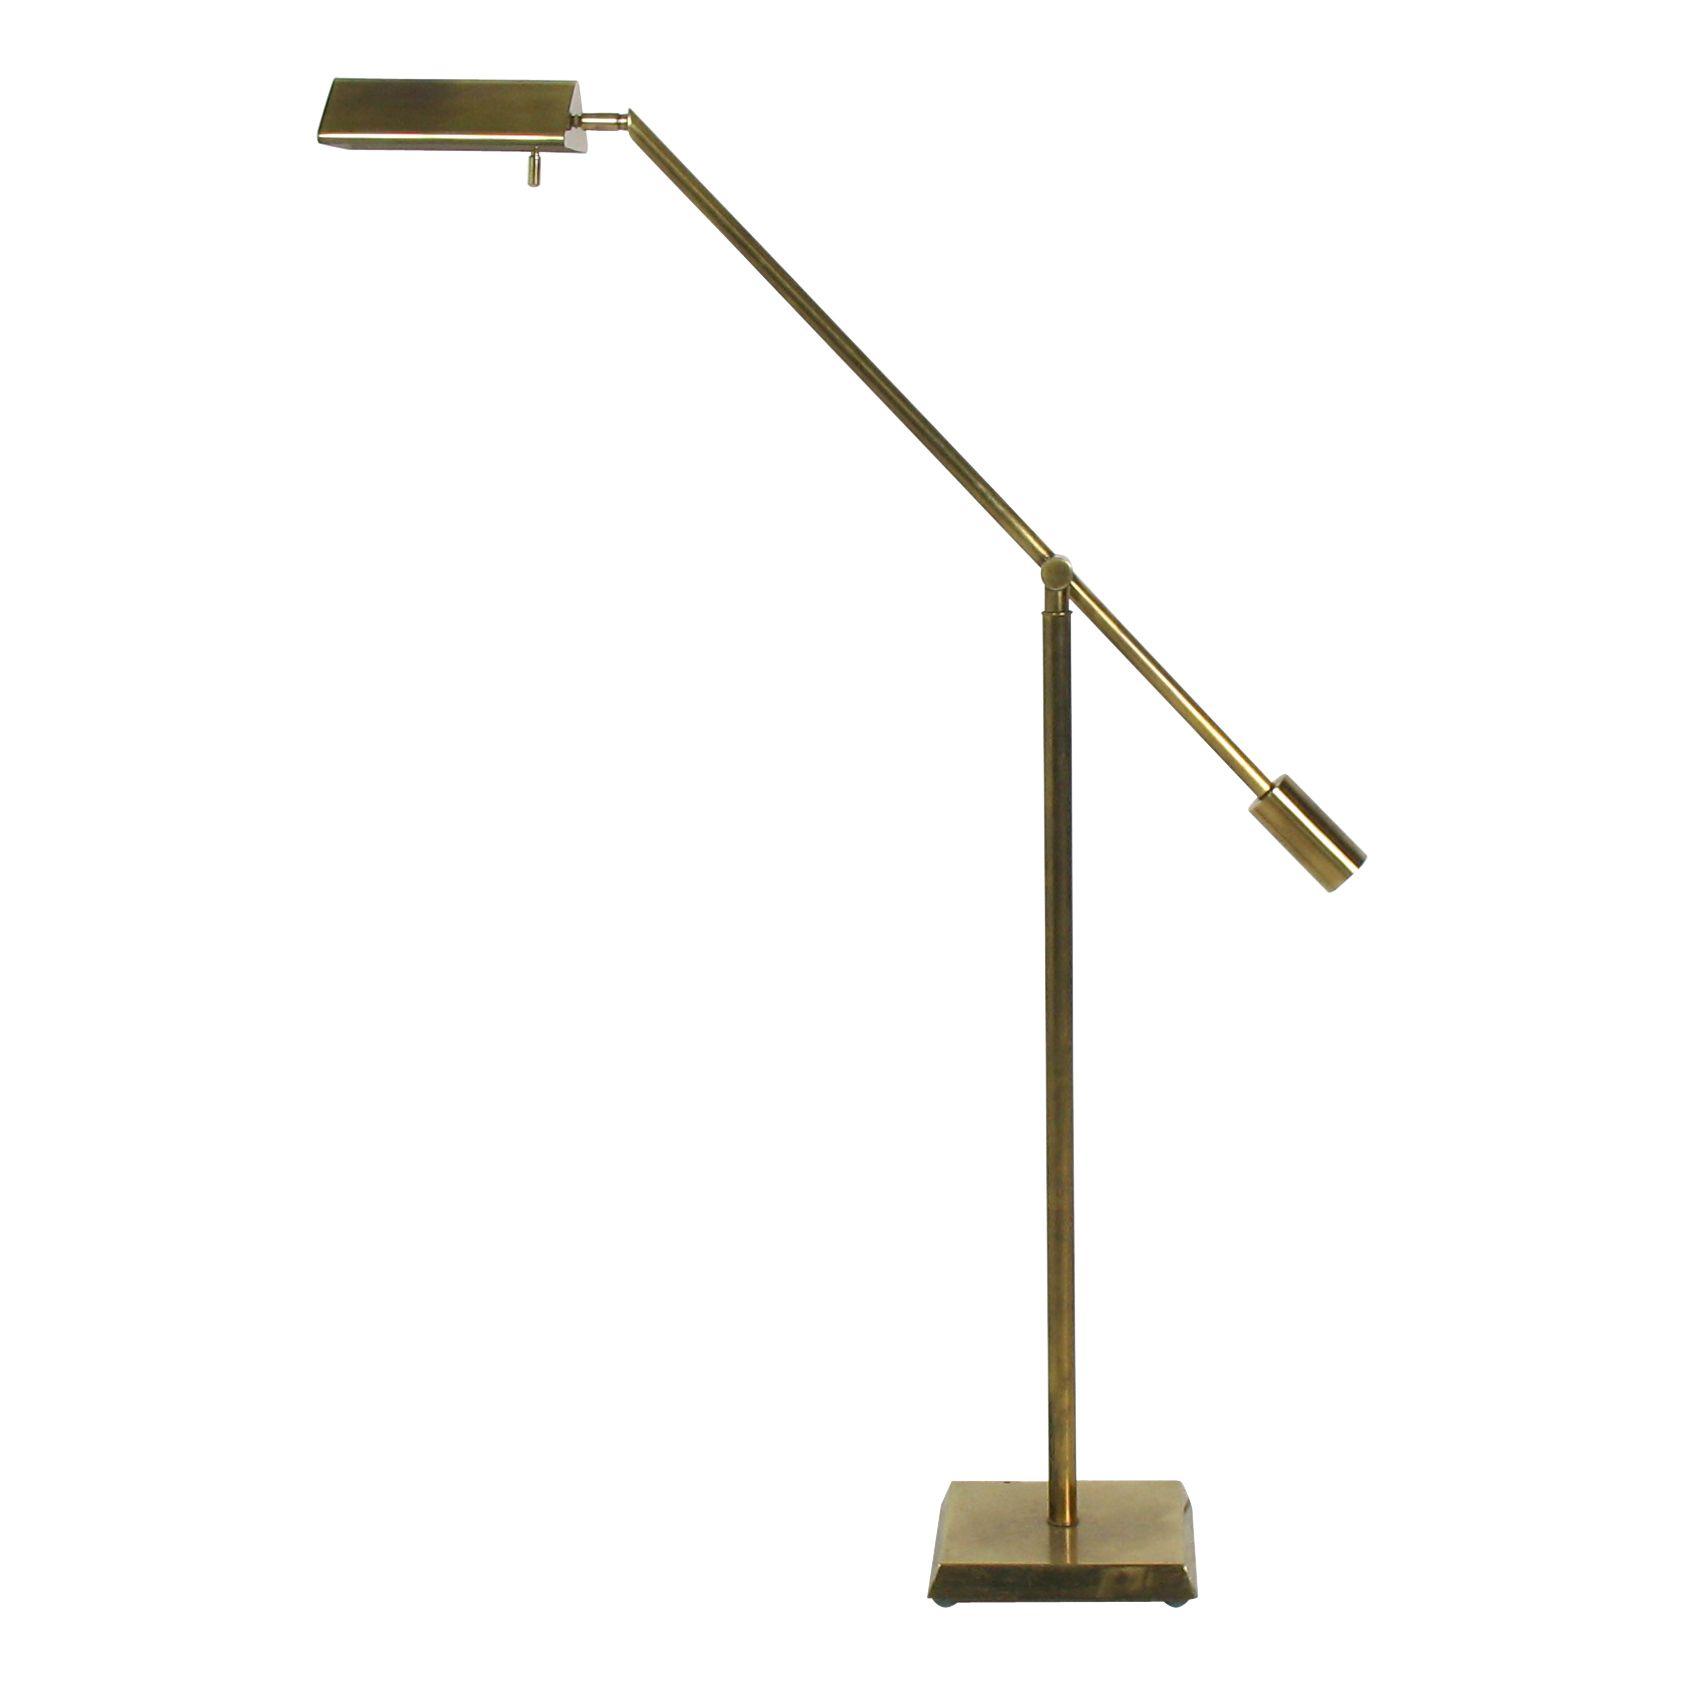 Adjustable Brass Floor Reading Lamp By Chapman 1600